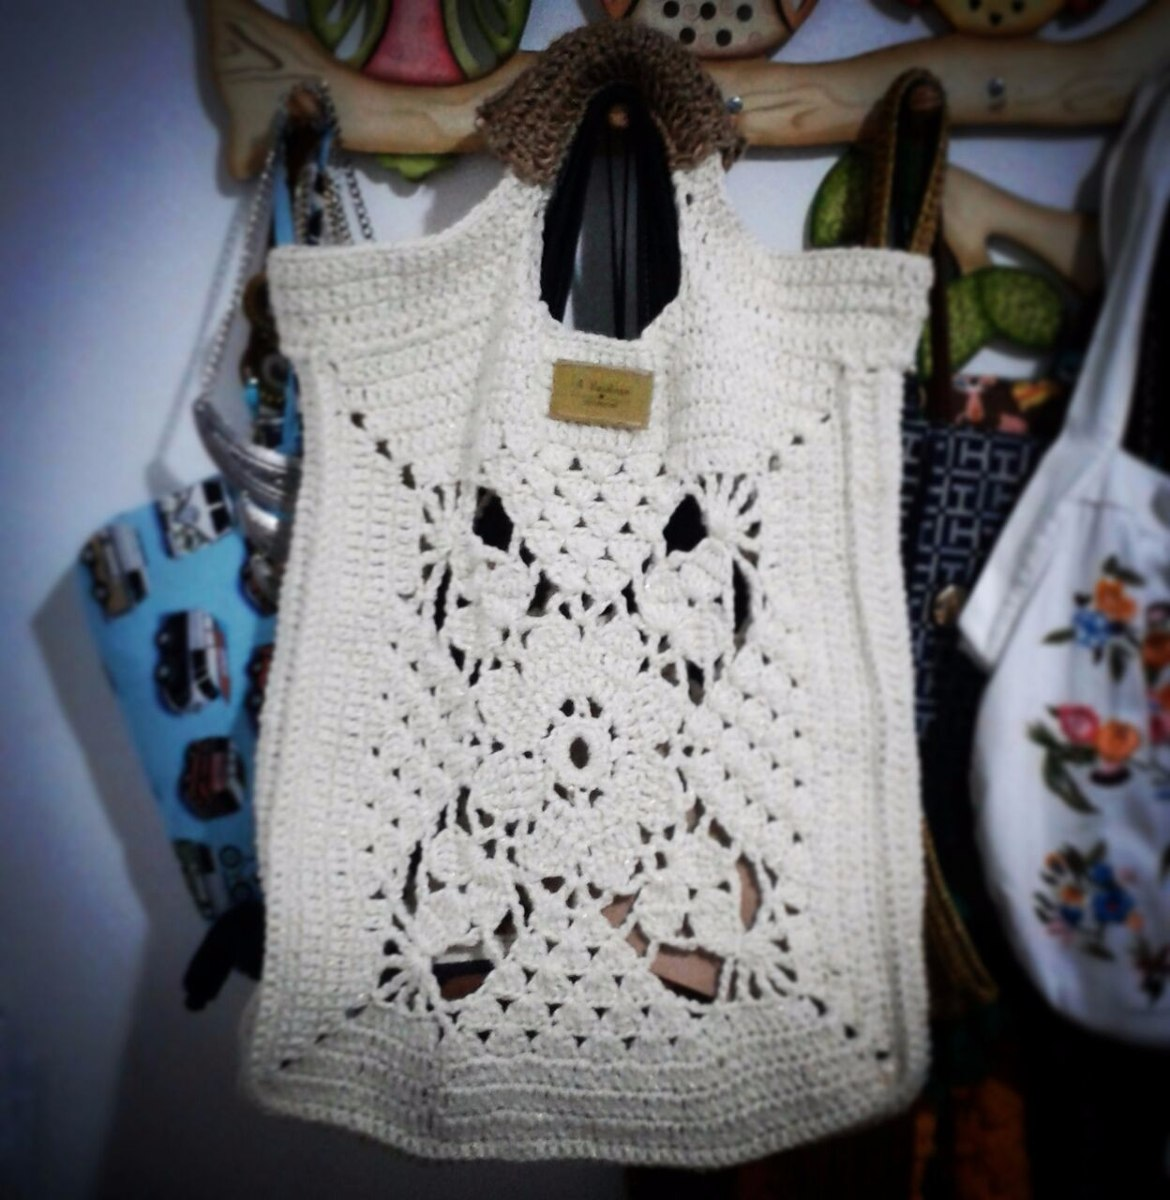 Ecobag Bolsa Mão Feminina Croche Crochê Crochet Boho Praia - R$ 339 ...